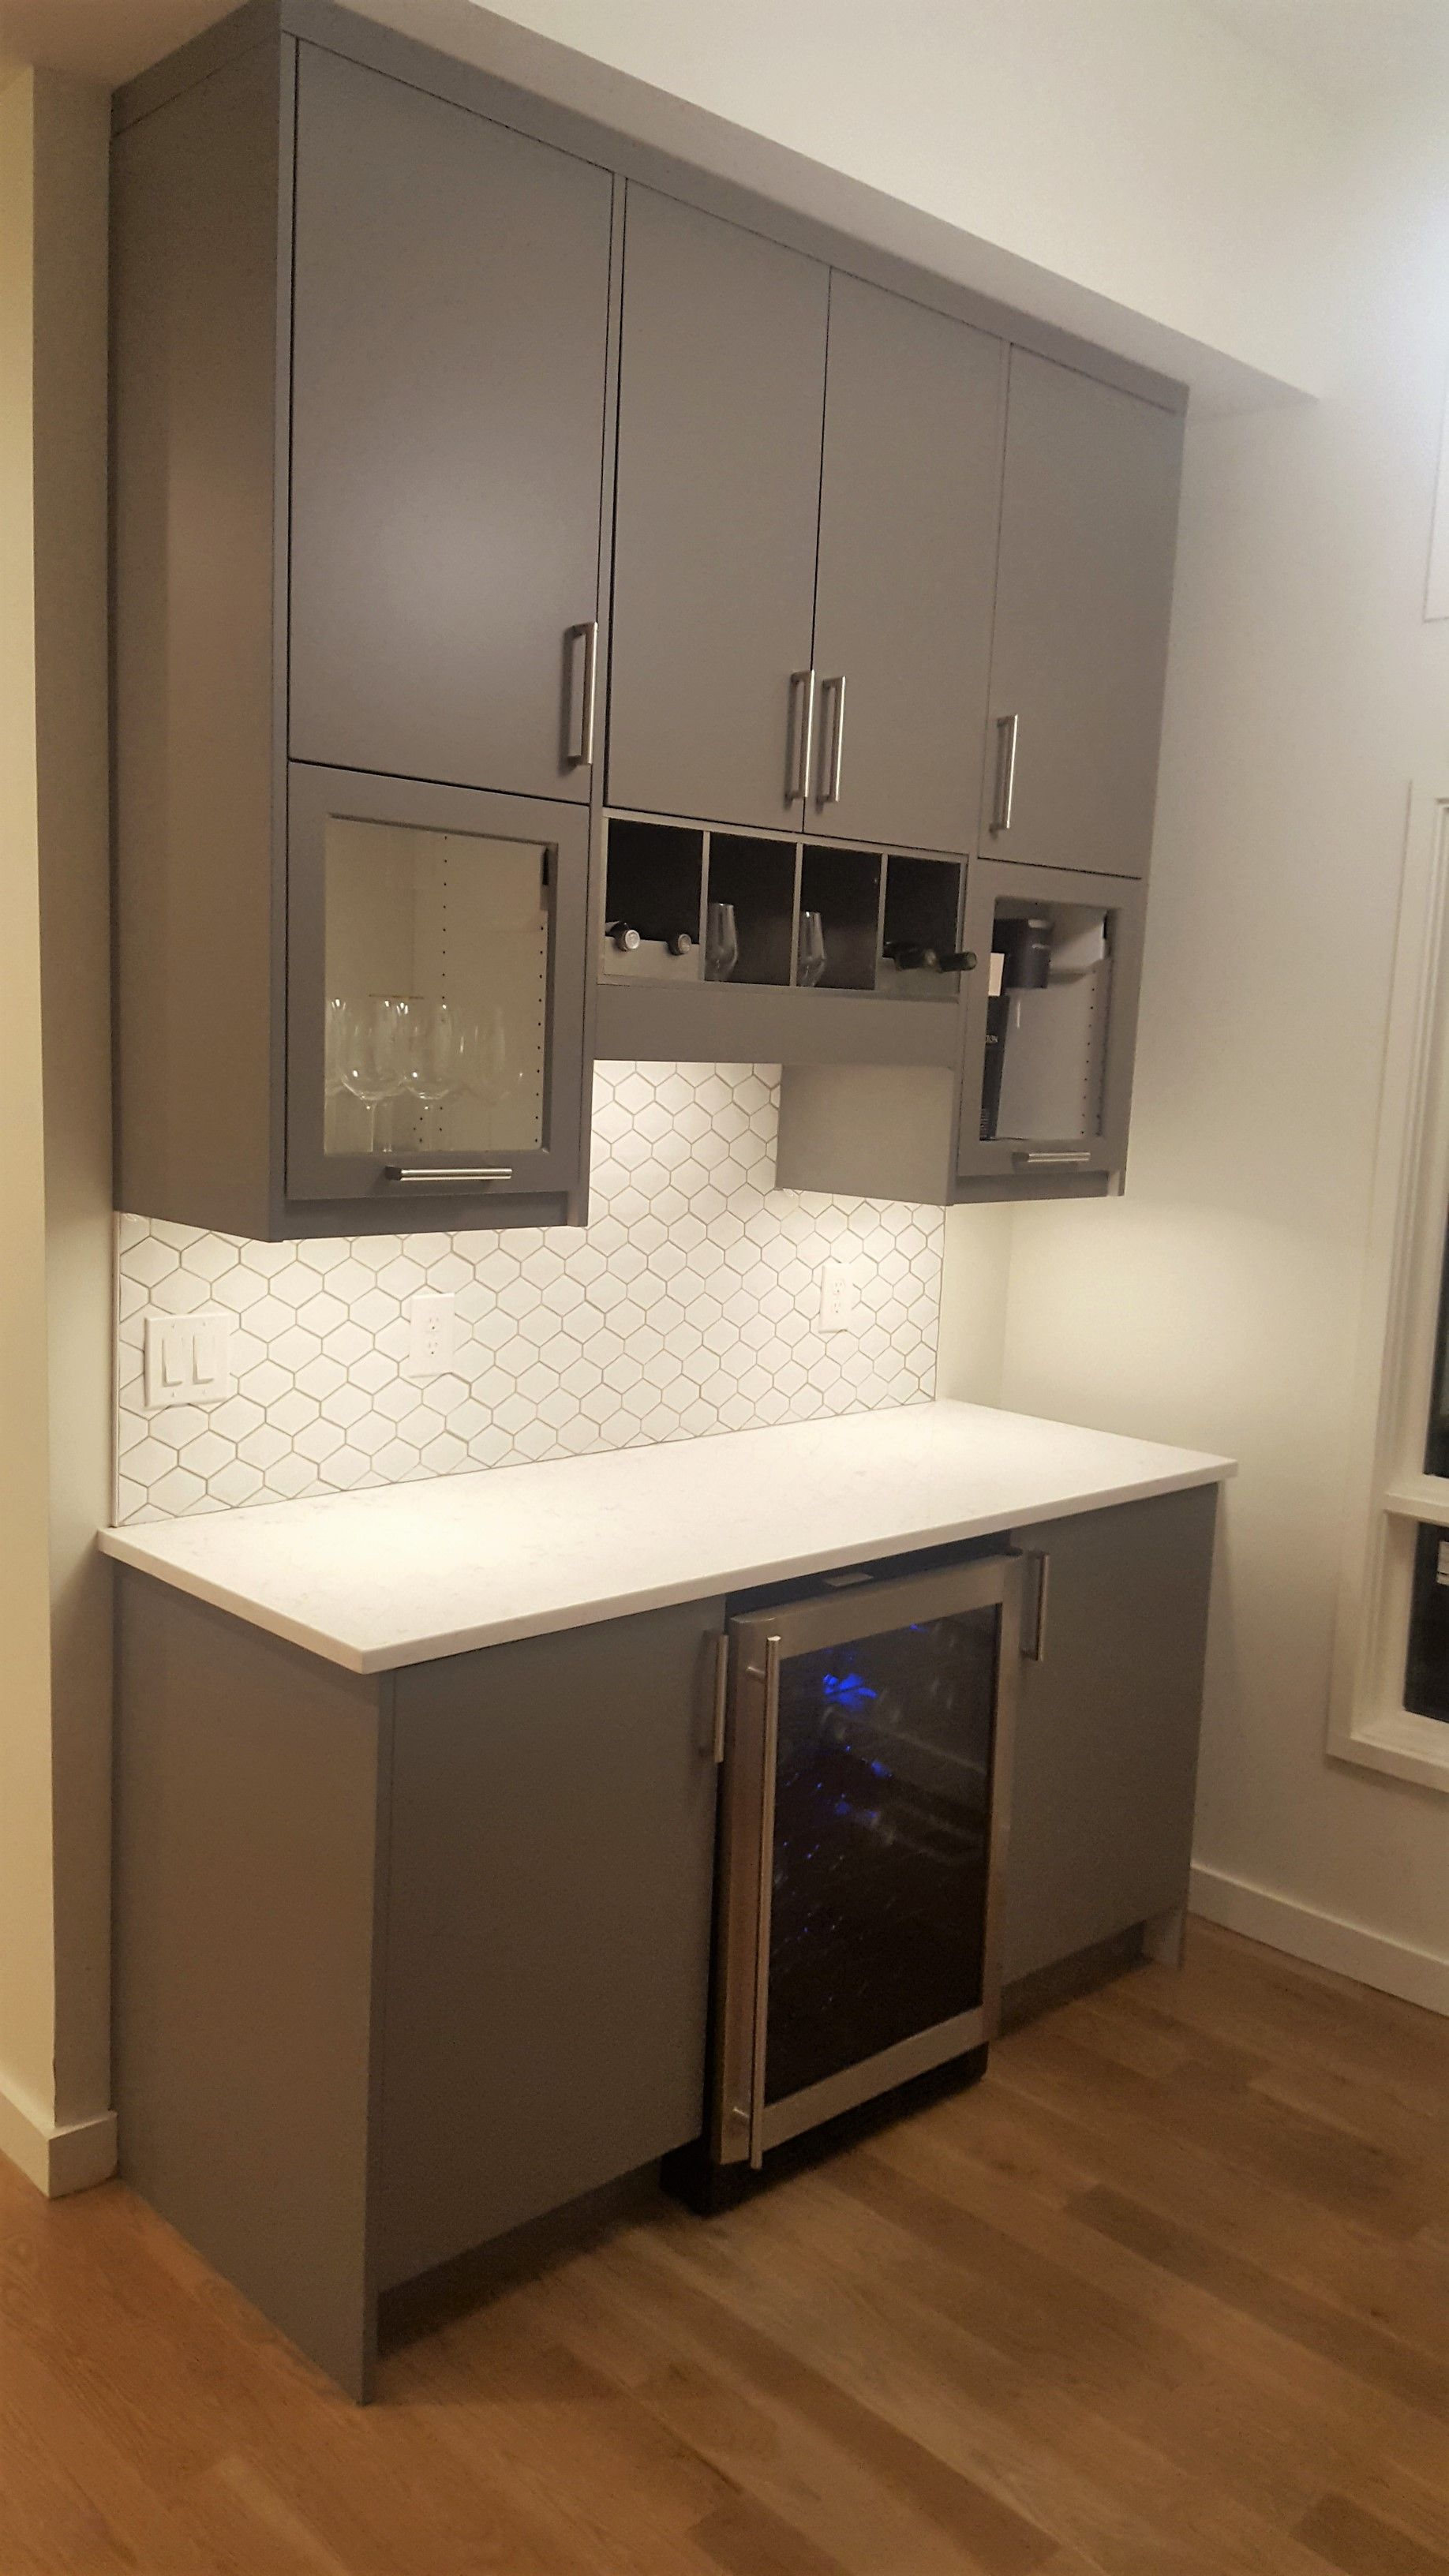 Inspired Kitchen Design Created Our Customer's Modern Kitchen Mesmerizing Pro Kitchen Design Decorating Inspiration